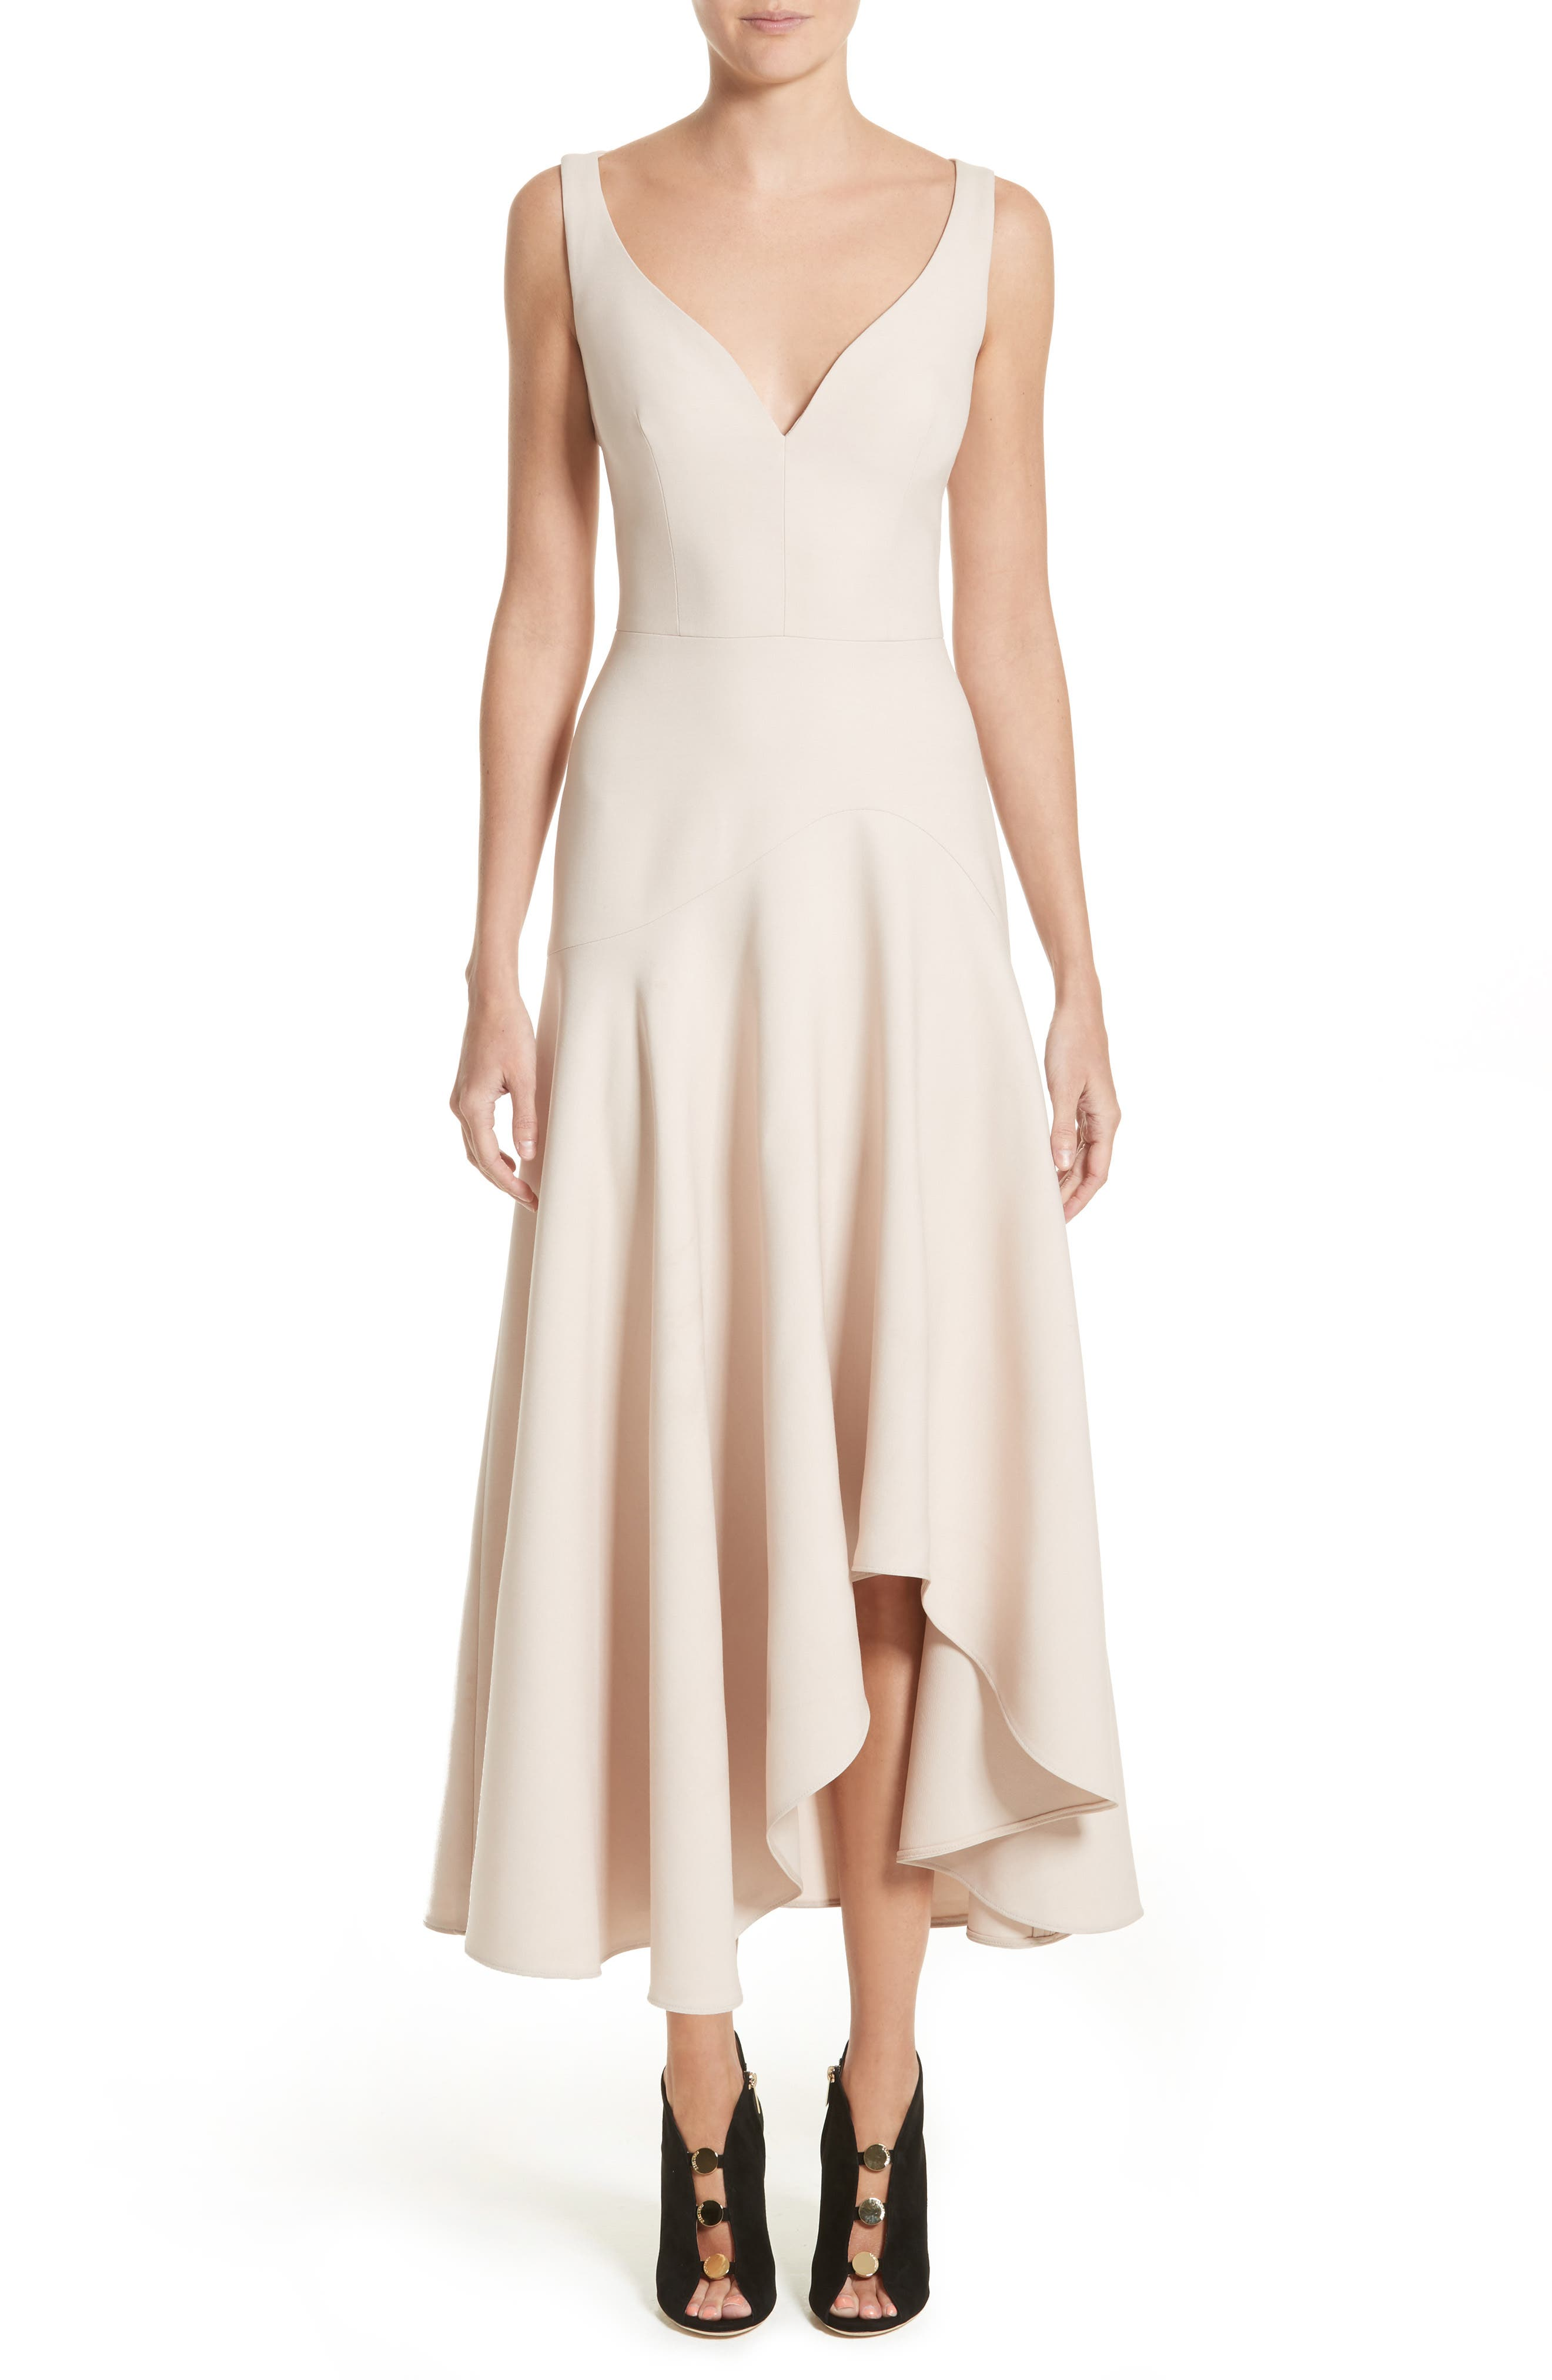 Silk Asymmetrical Dress,                             Main thumbnail 1, color,                             020